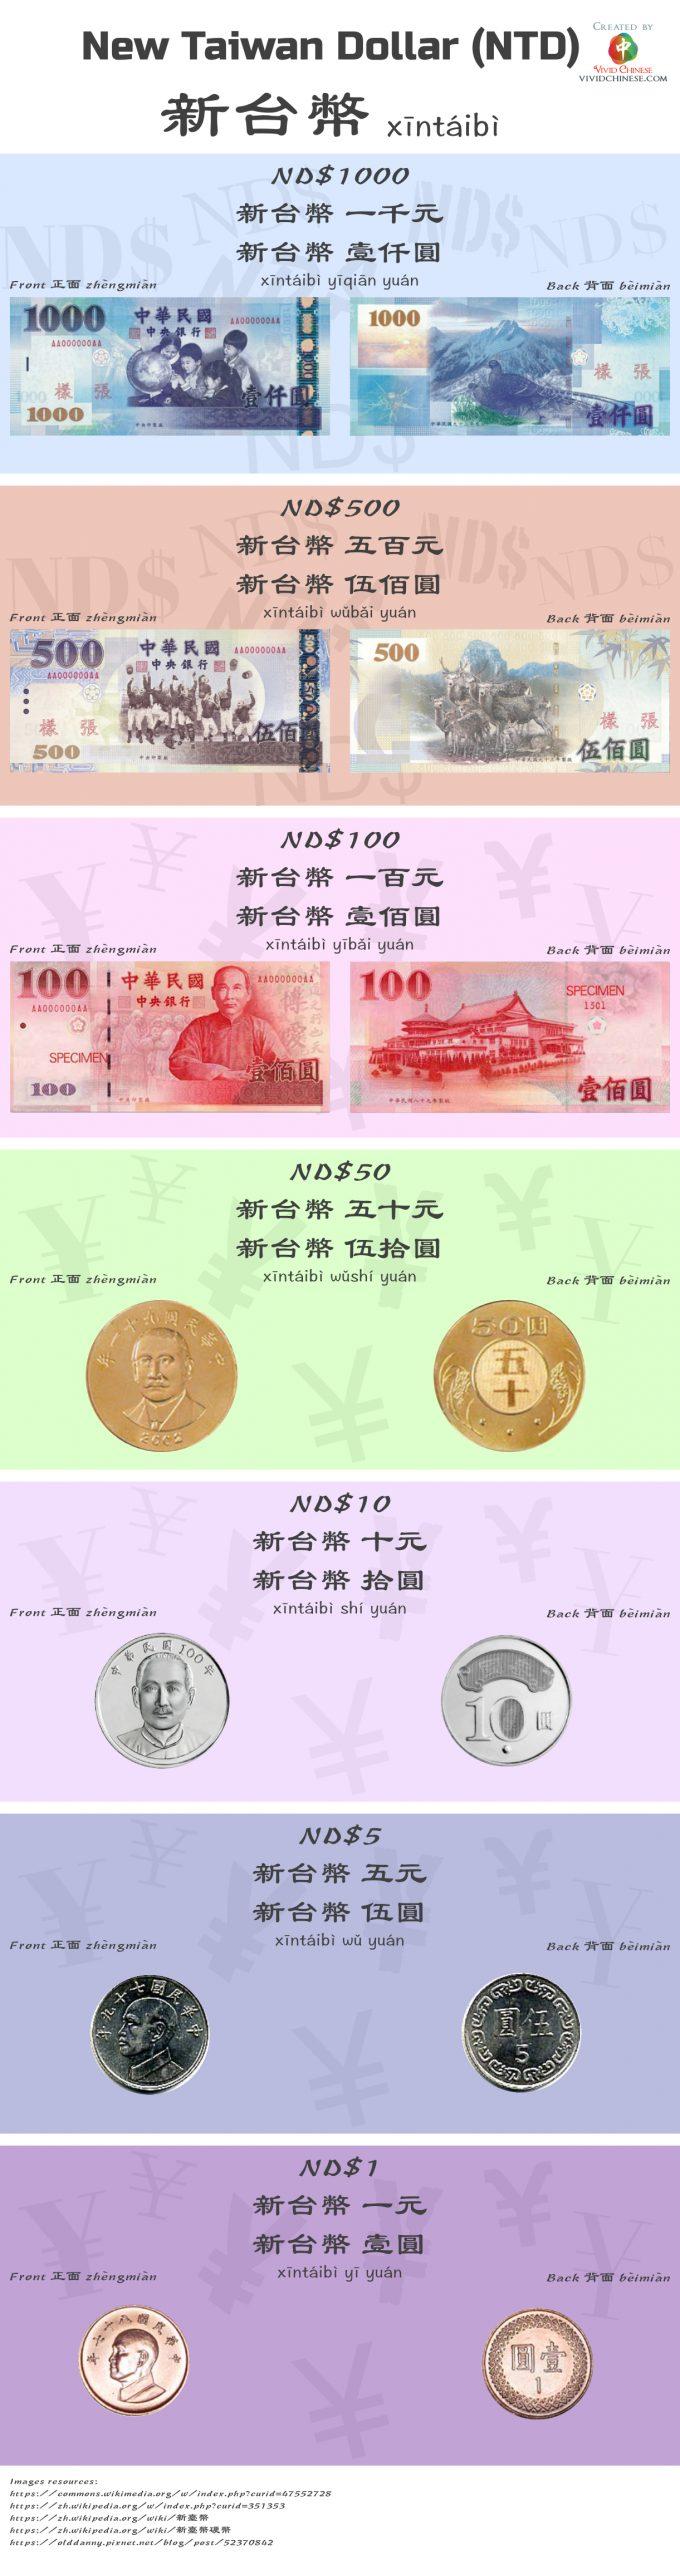 NTD money in Chinese